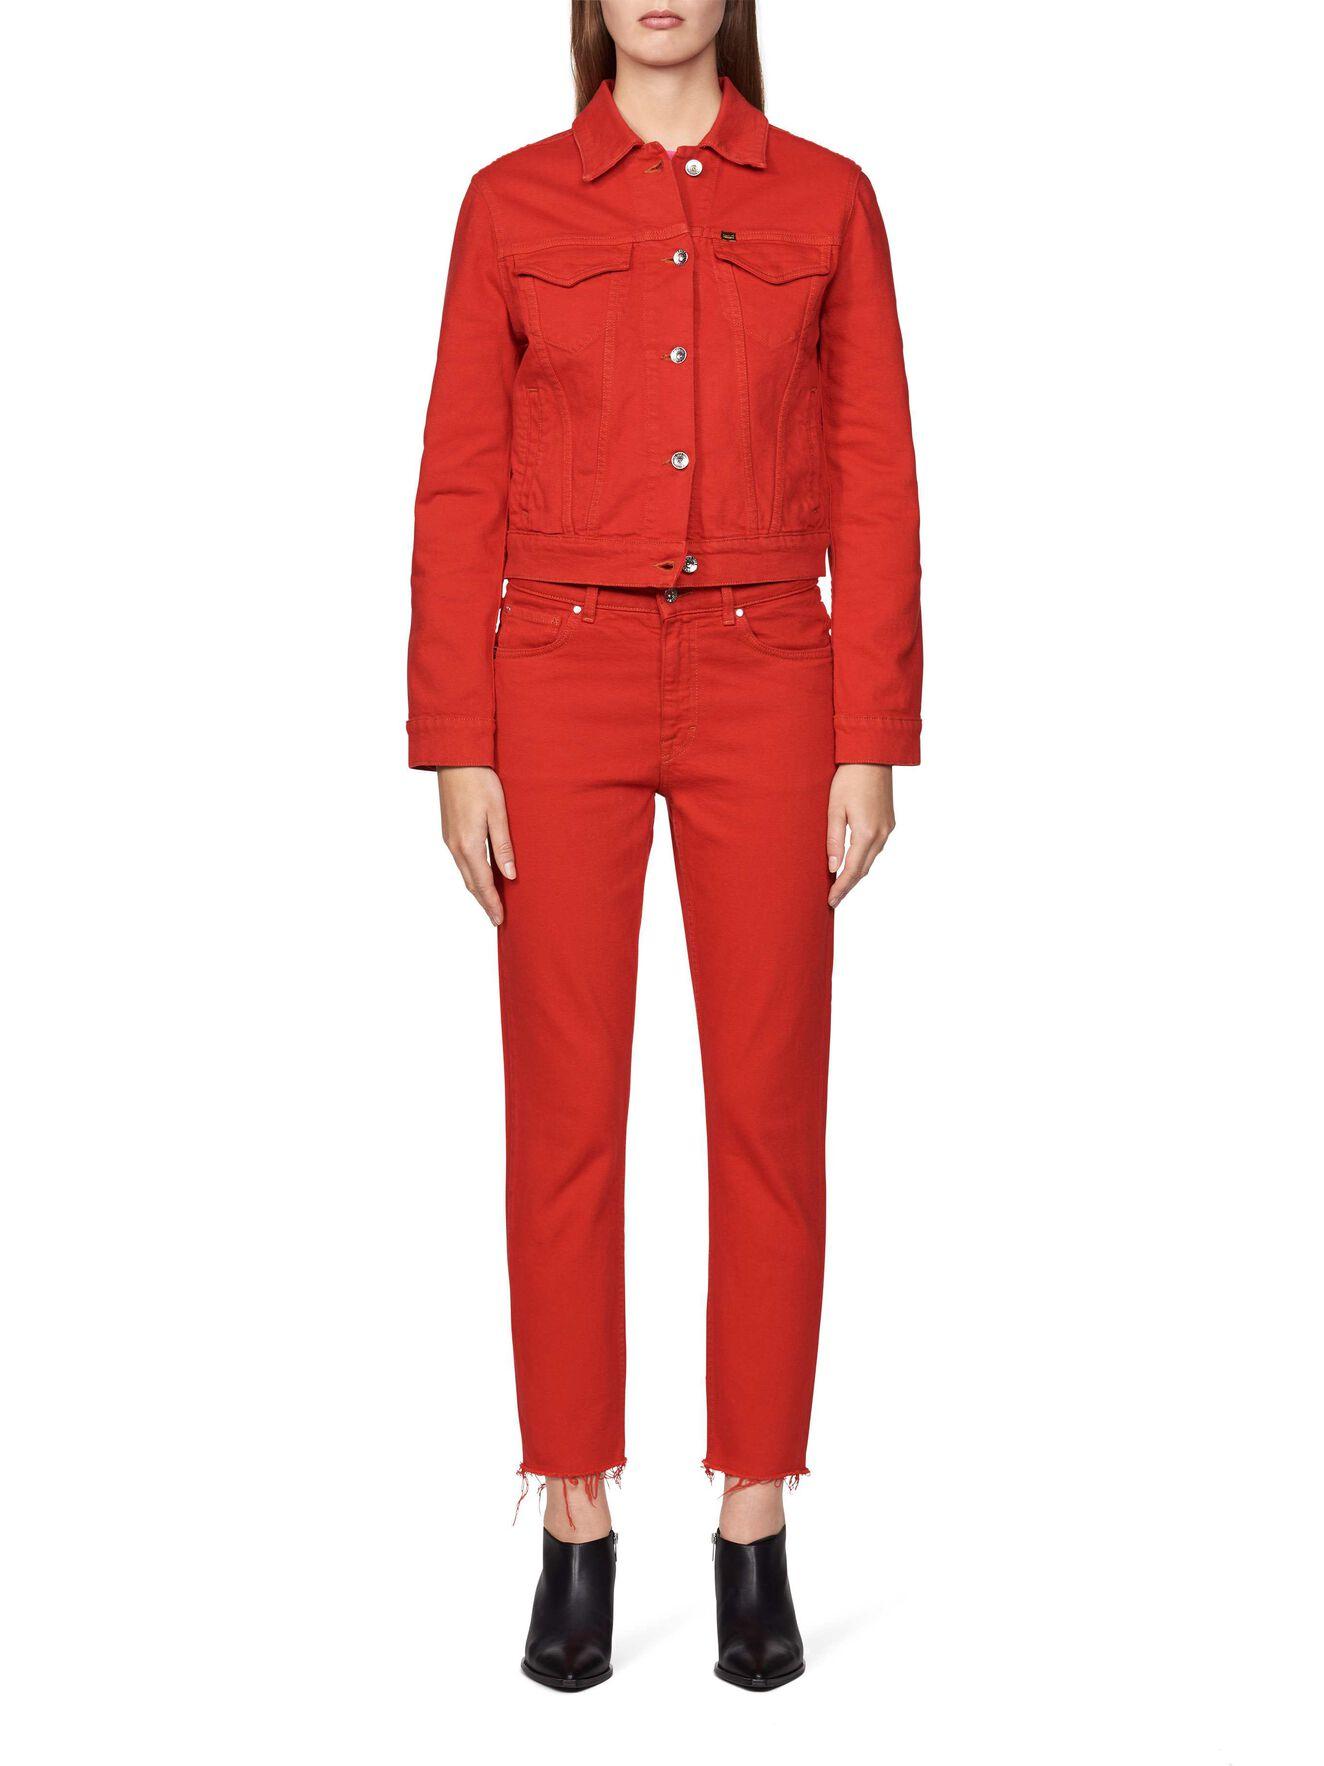 True Jacket in Valiant Poppy from Tiger of Sweden